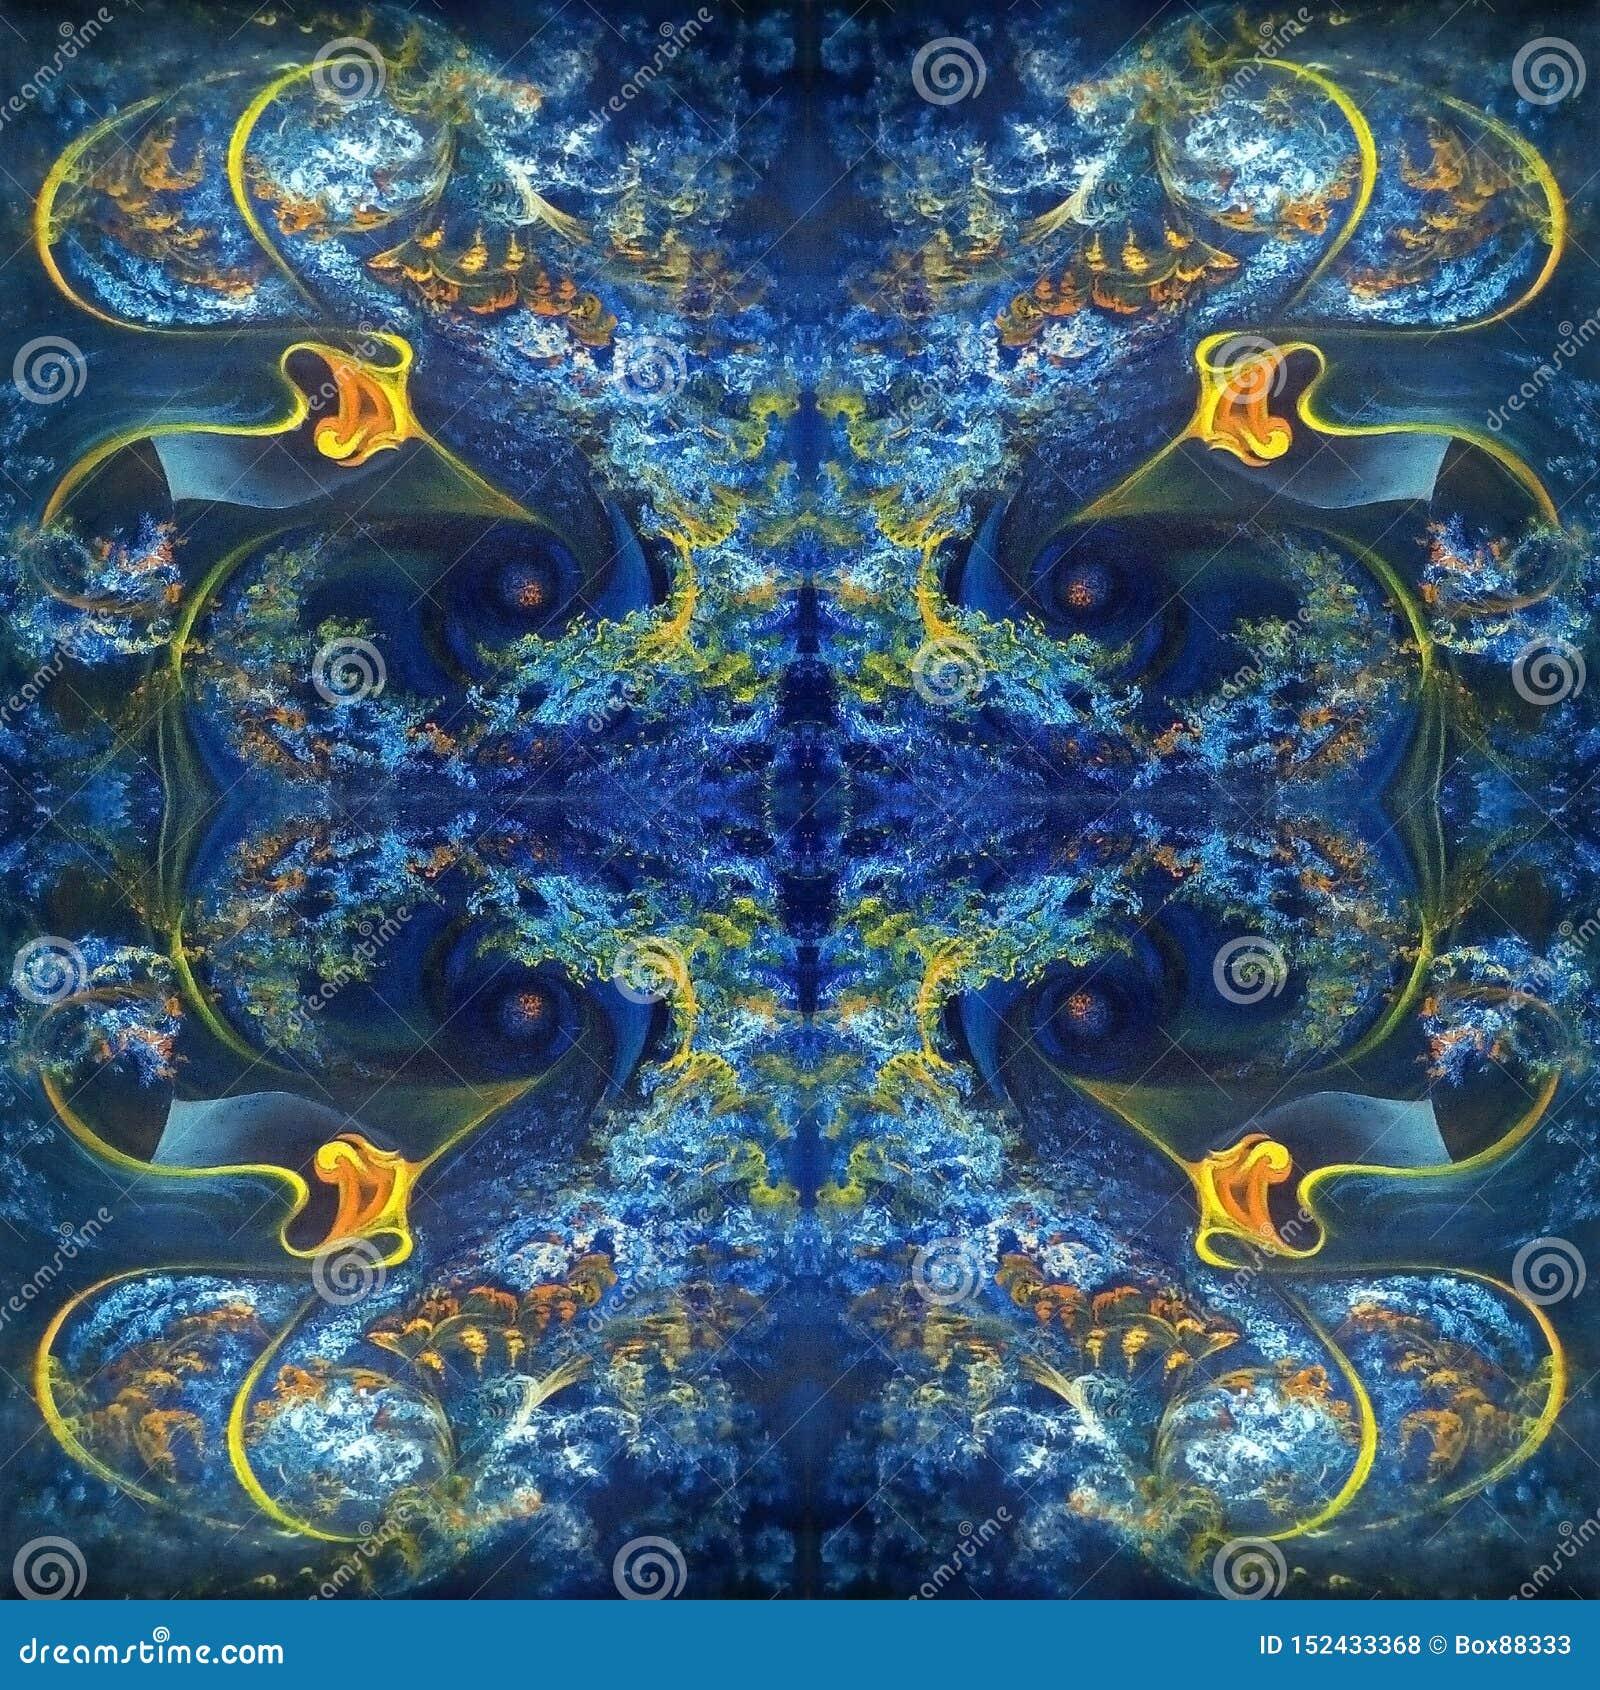 Симметричная абстрактная картина в сини с оранжевыми элементами E